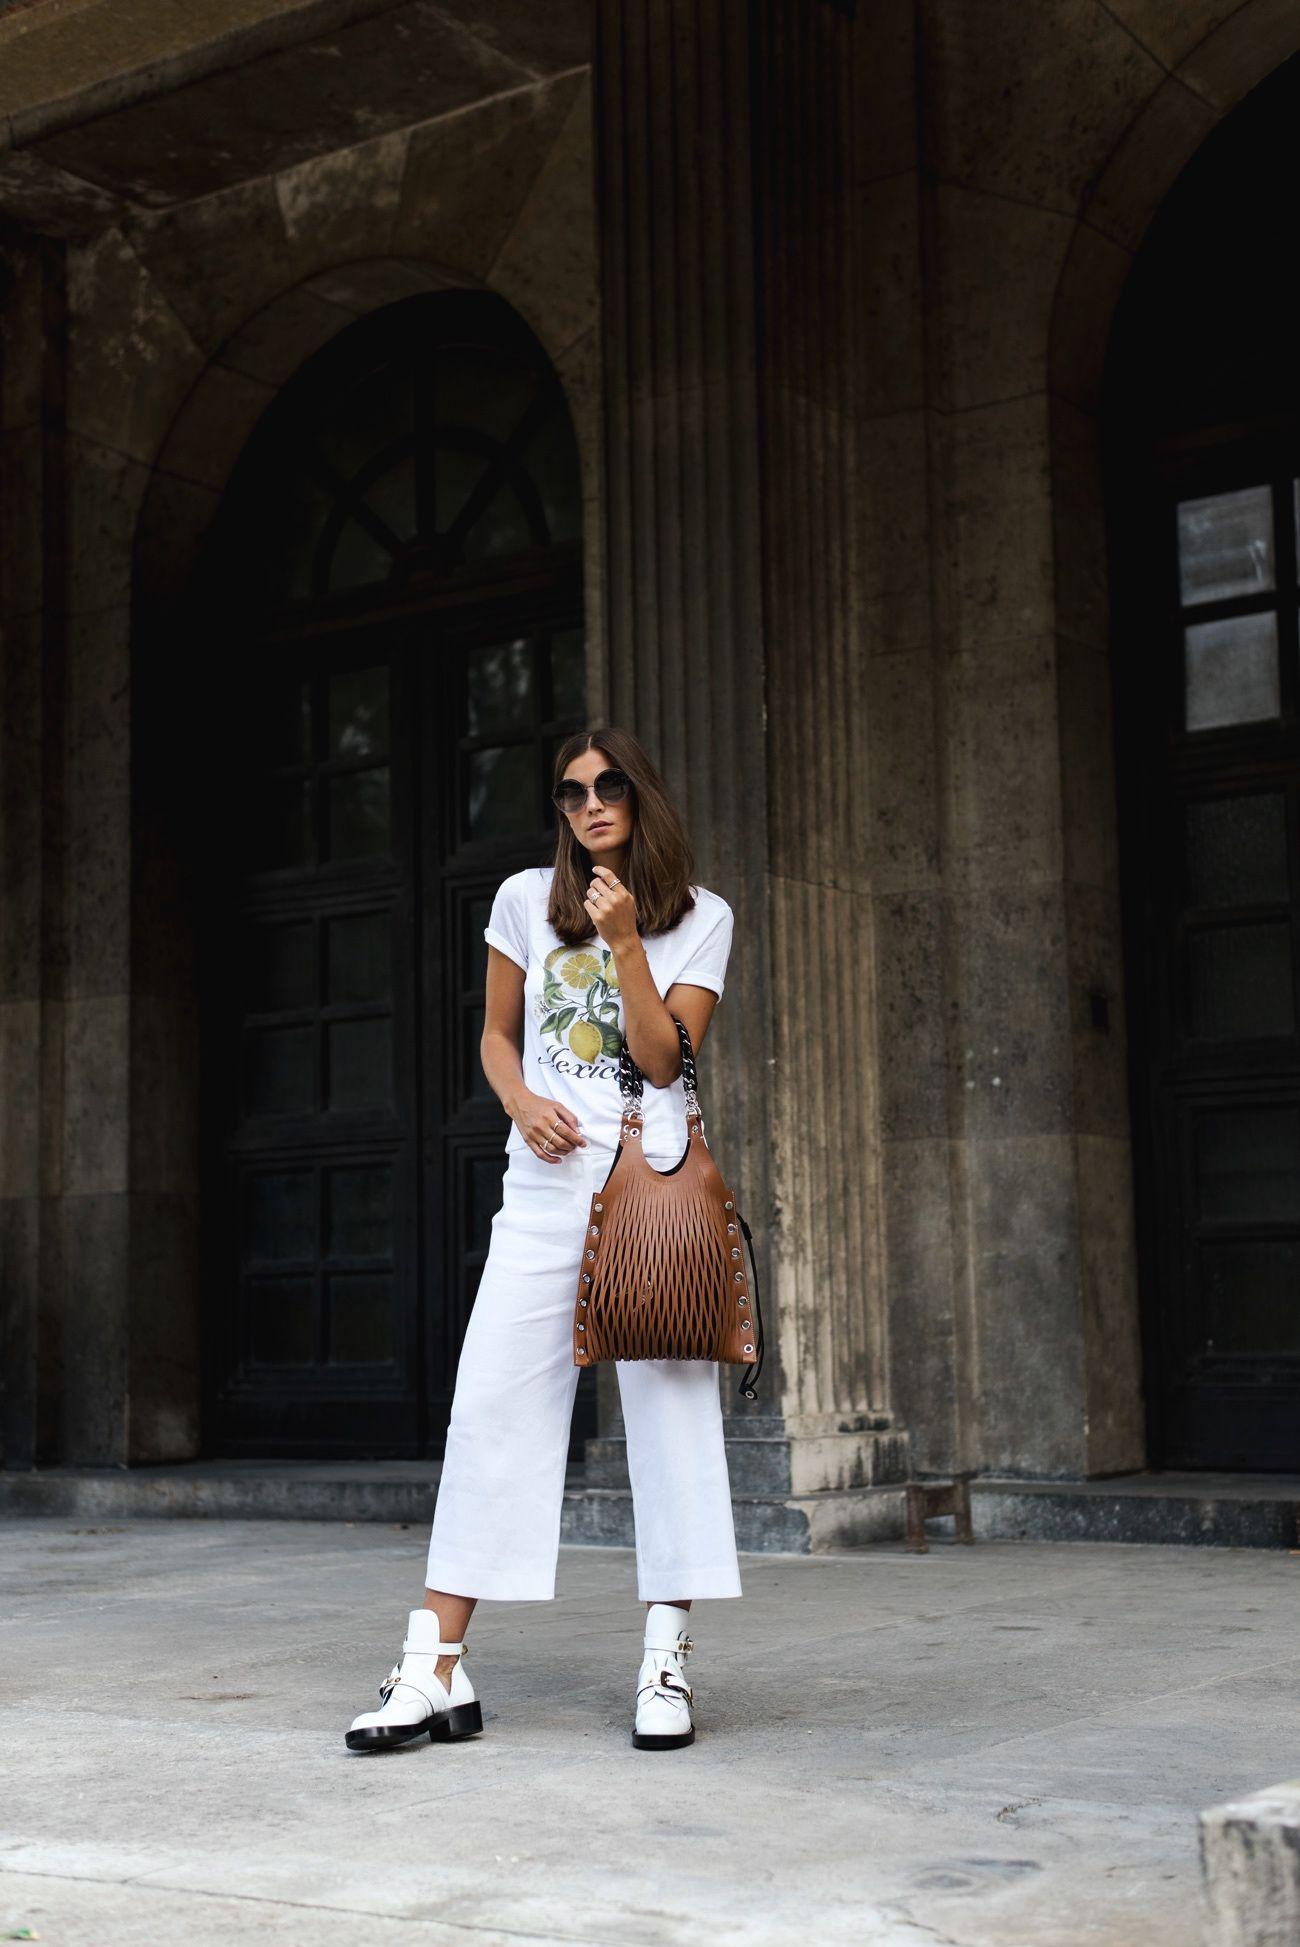 1a94cf71b3a Nina Schwichtenberg trägt einen All White Look mit Balenciaga Cut Out  Boots